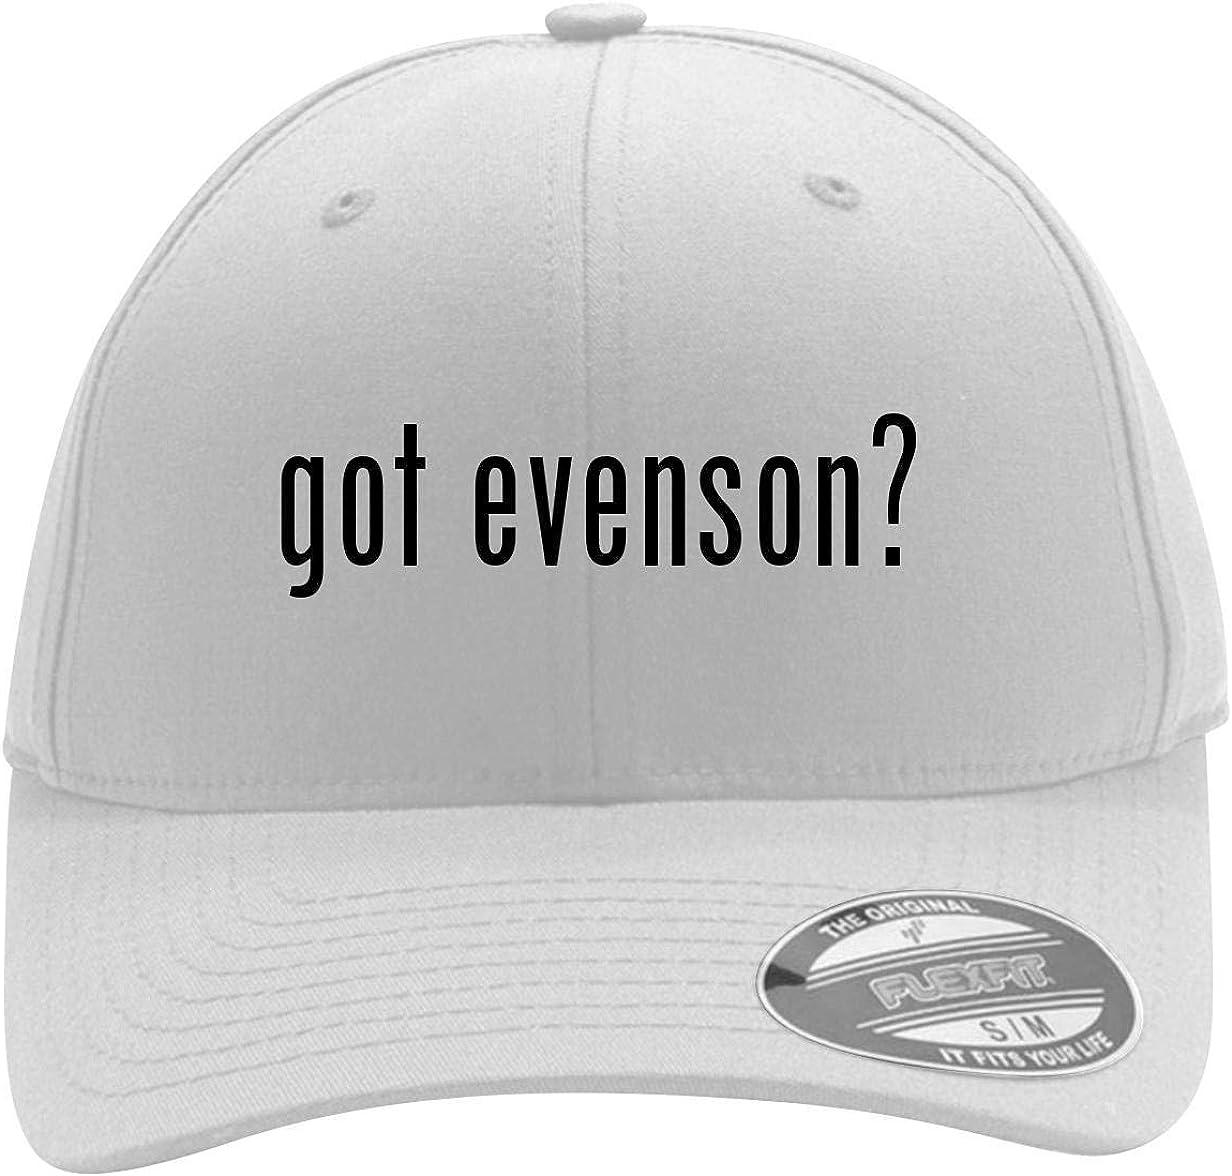 got Evenson - Men's Flexfit Baseball Cap Hat 61fSOtGsYgL